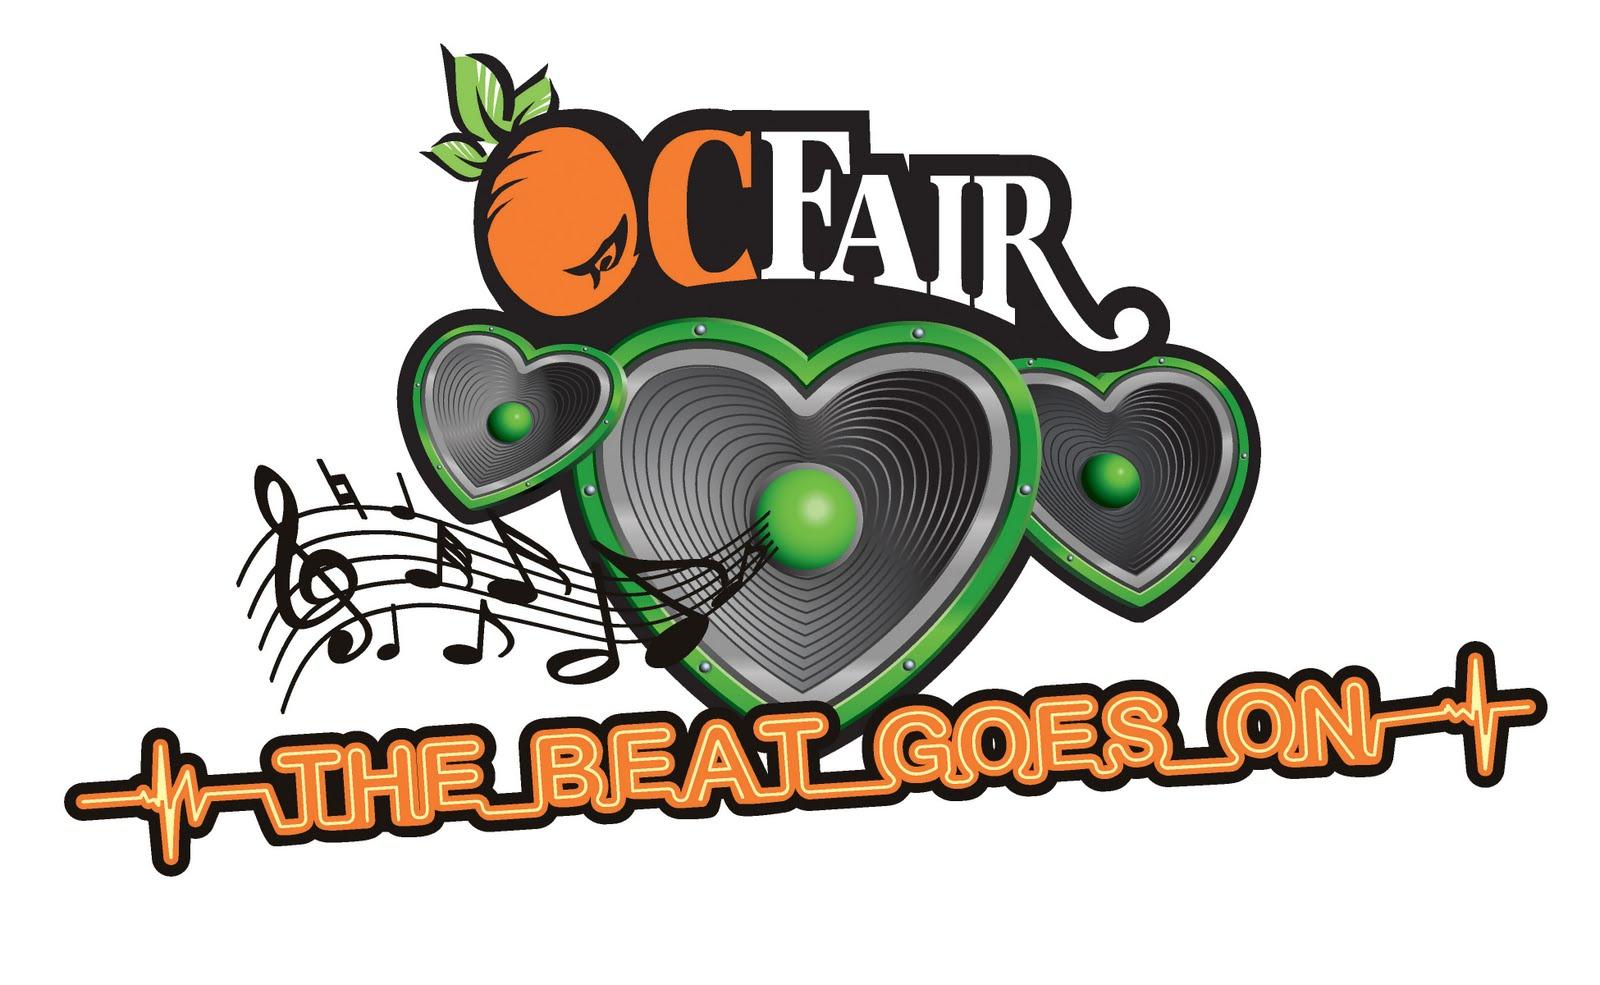 California Orange County Fair. La County Fairgrounds Calendar. View ...